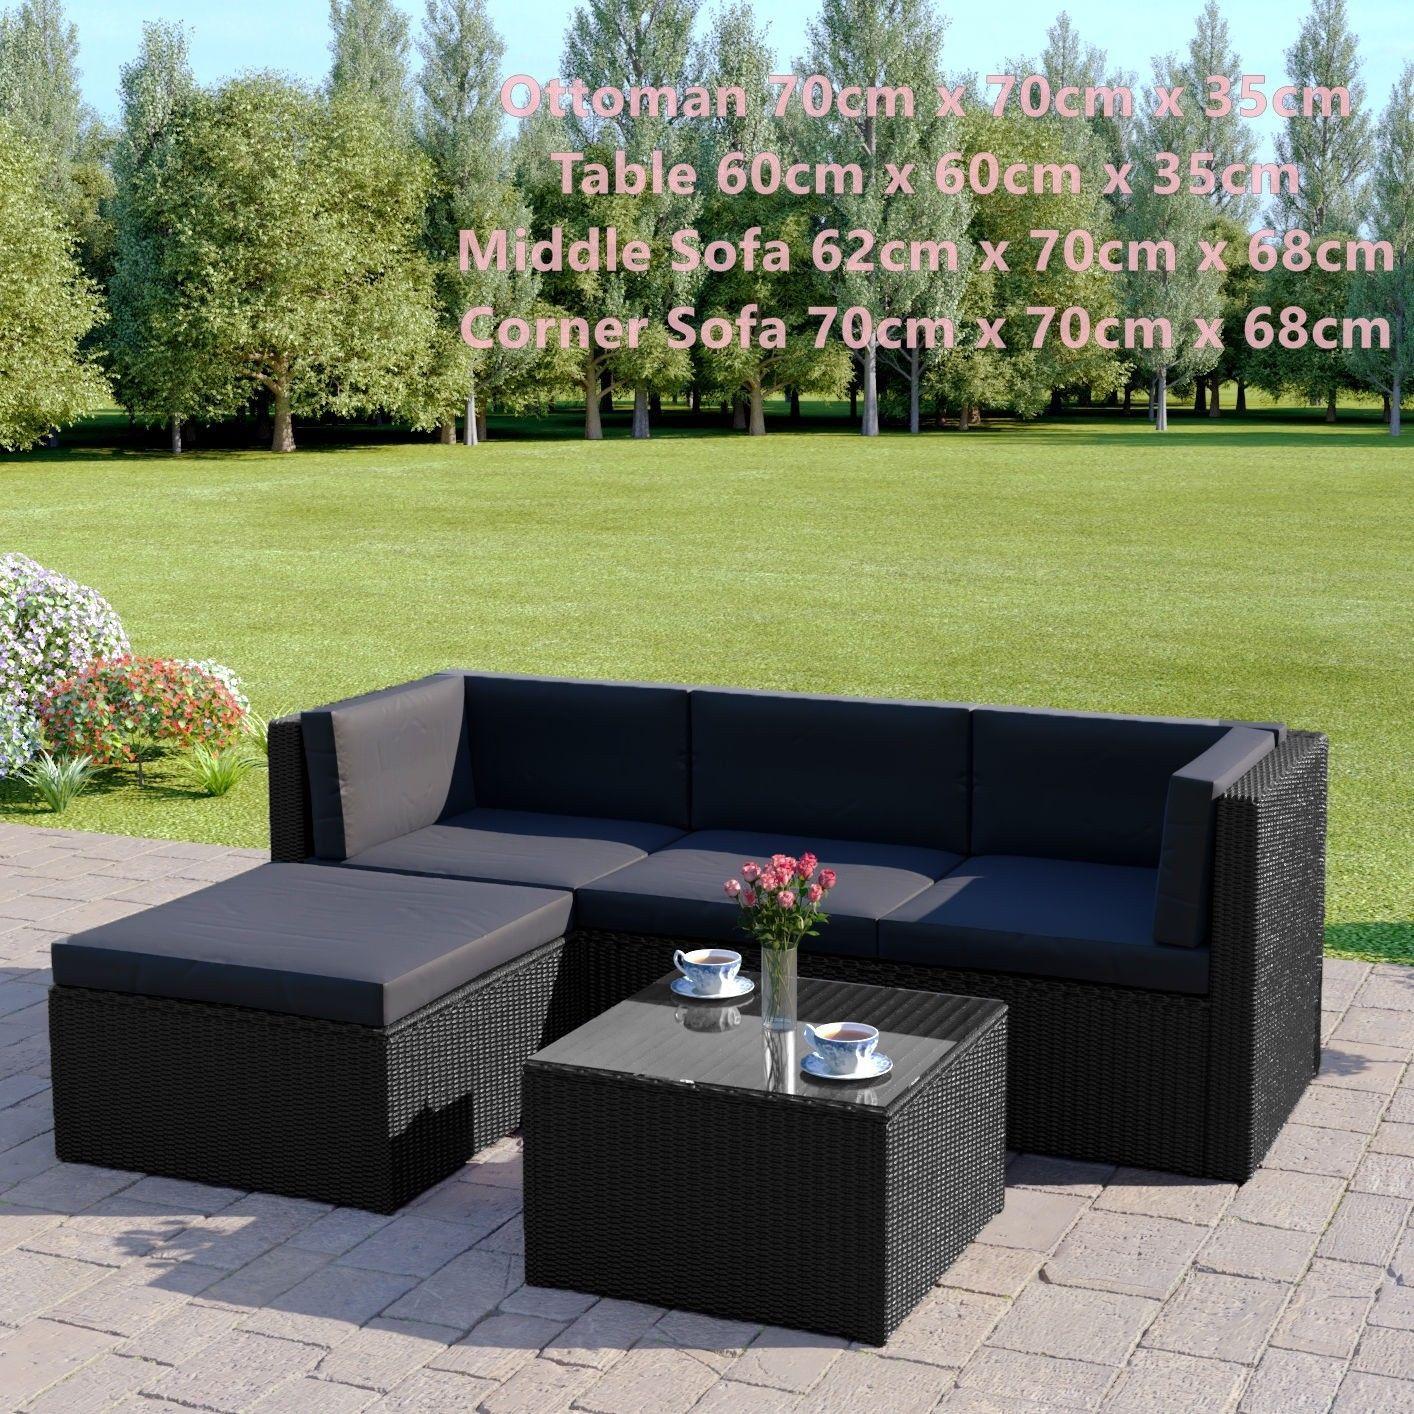 Black Rattan Sofa & Stool Set Modular Outdoor Garden Furniture Dark Cushions New image 5